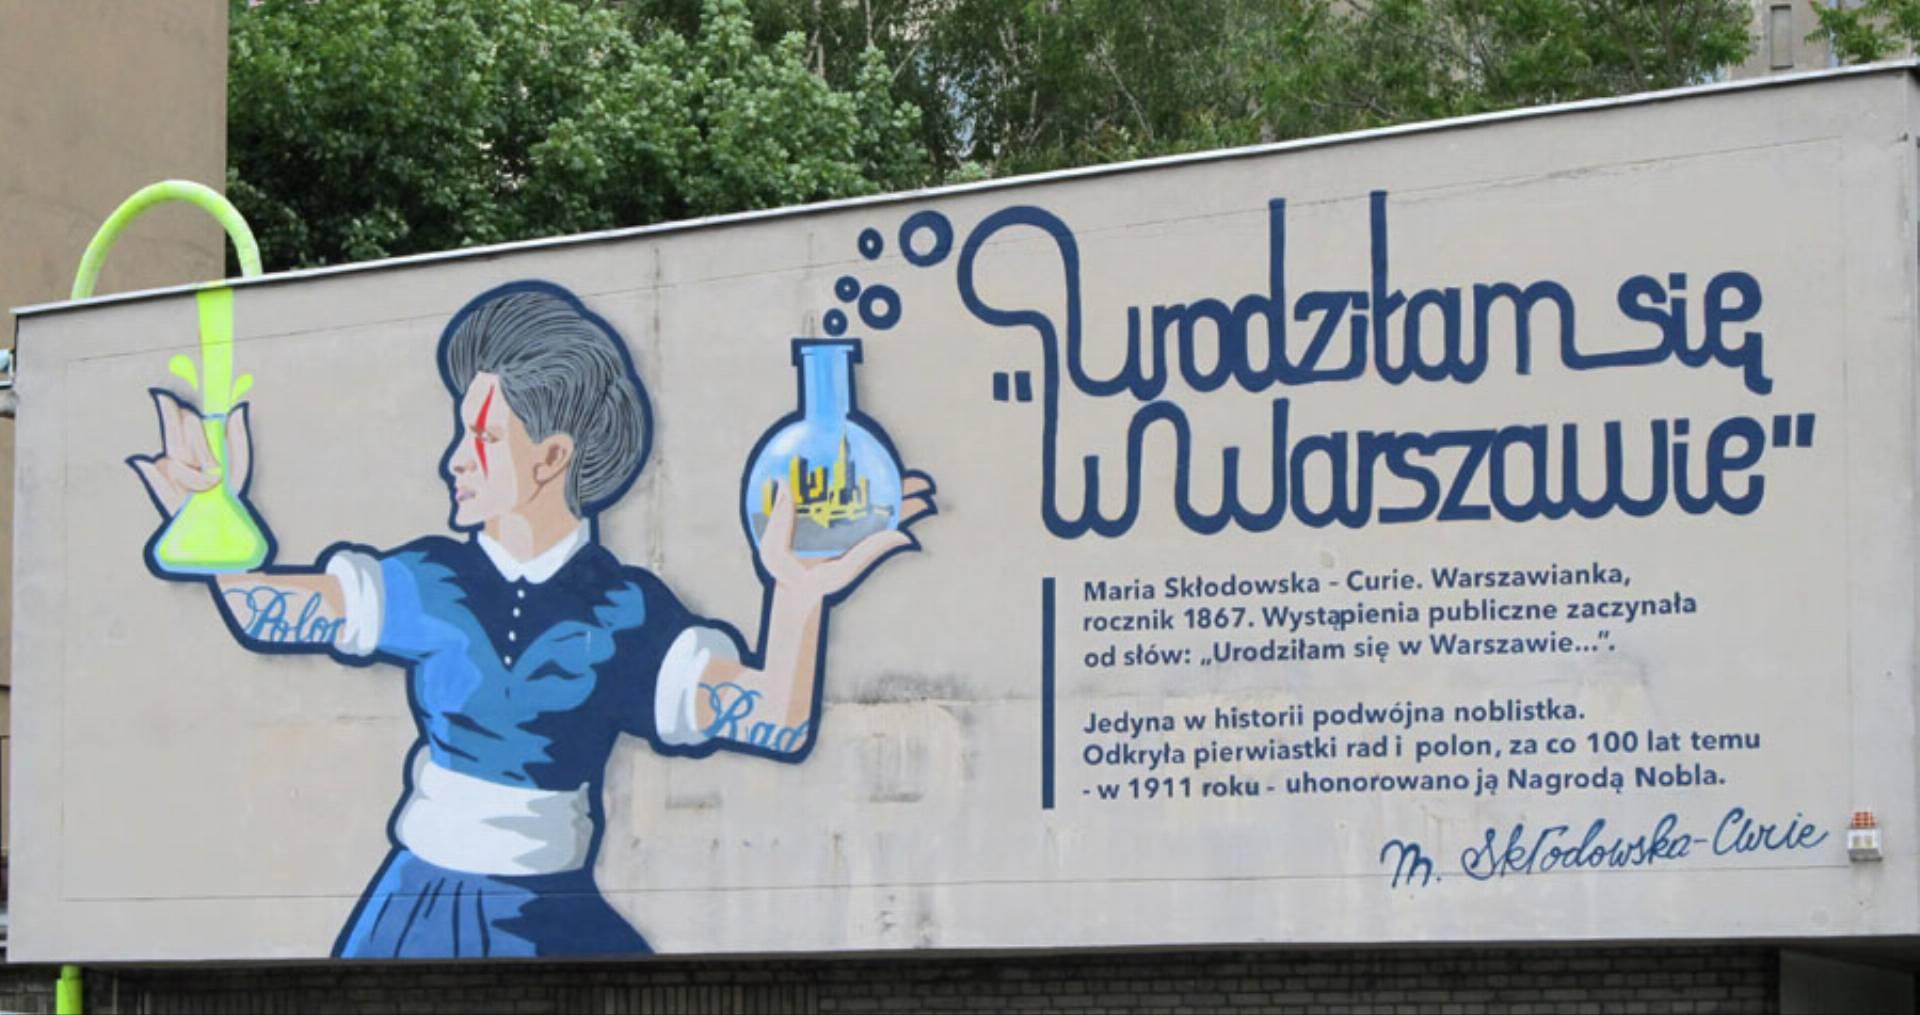 mural_Warszawa_commons.wikimedia.org